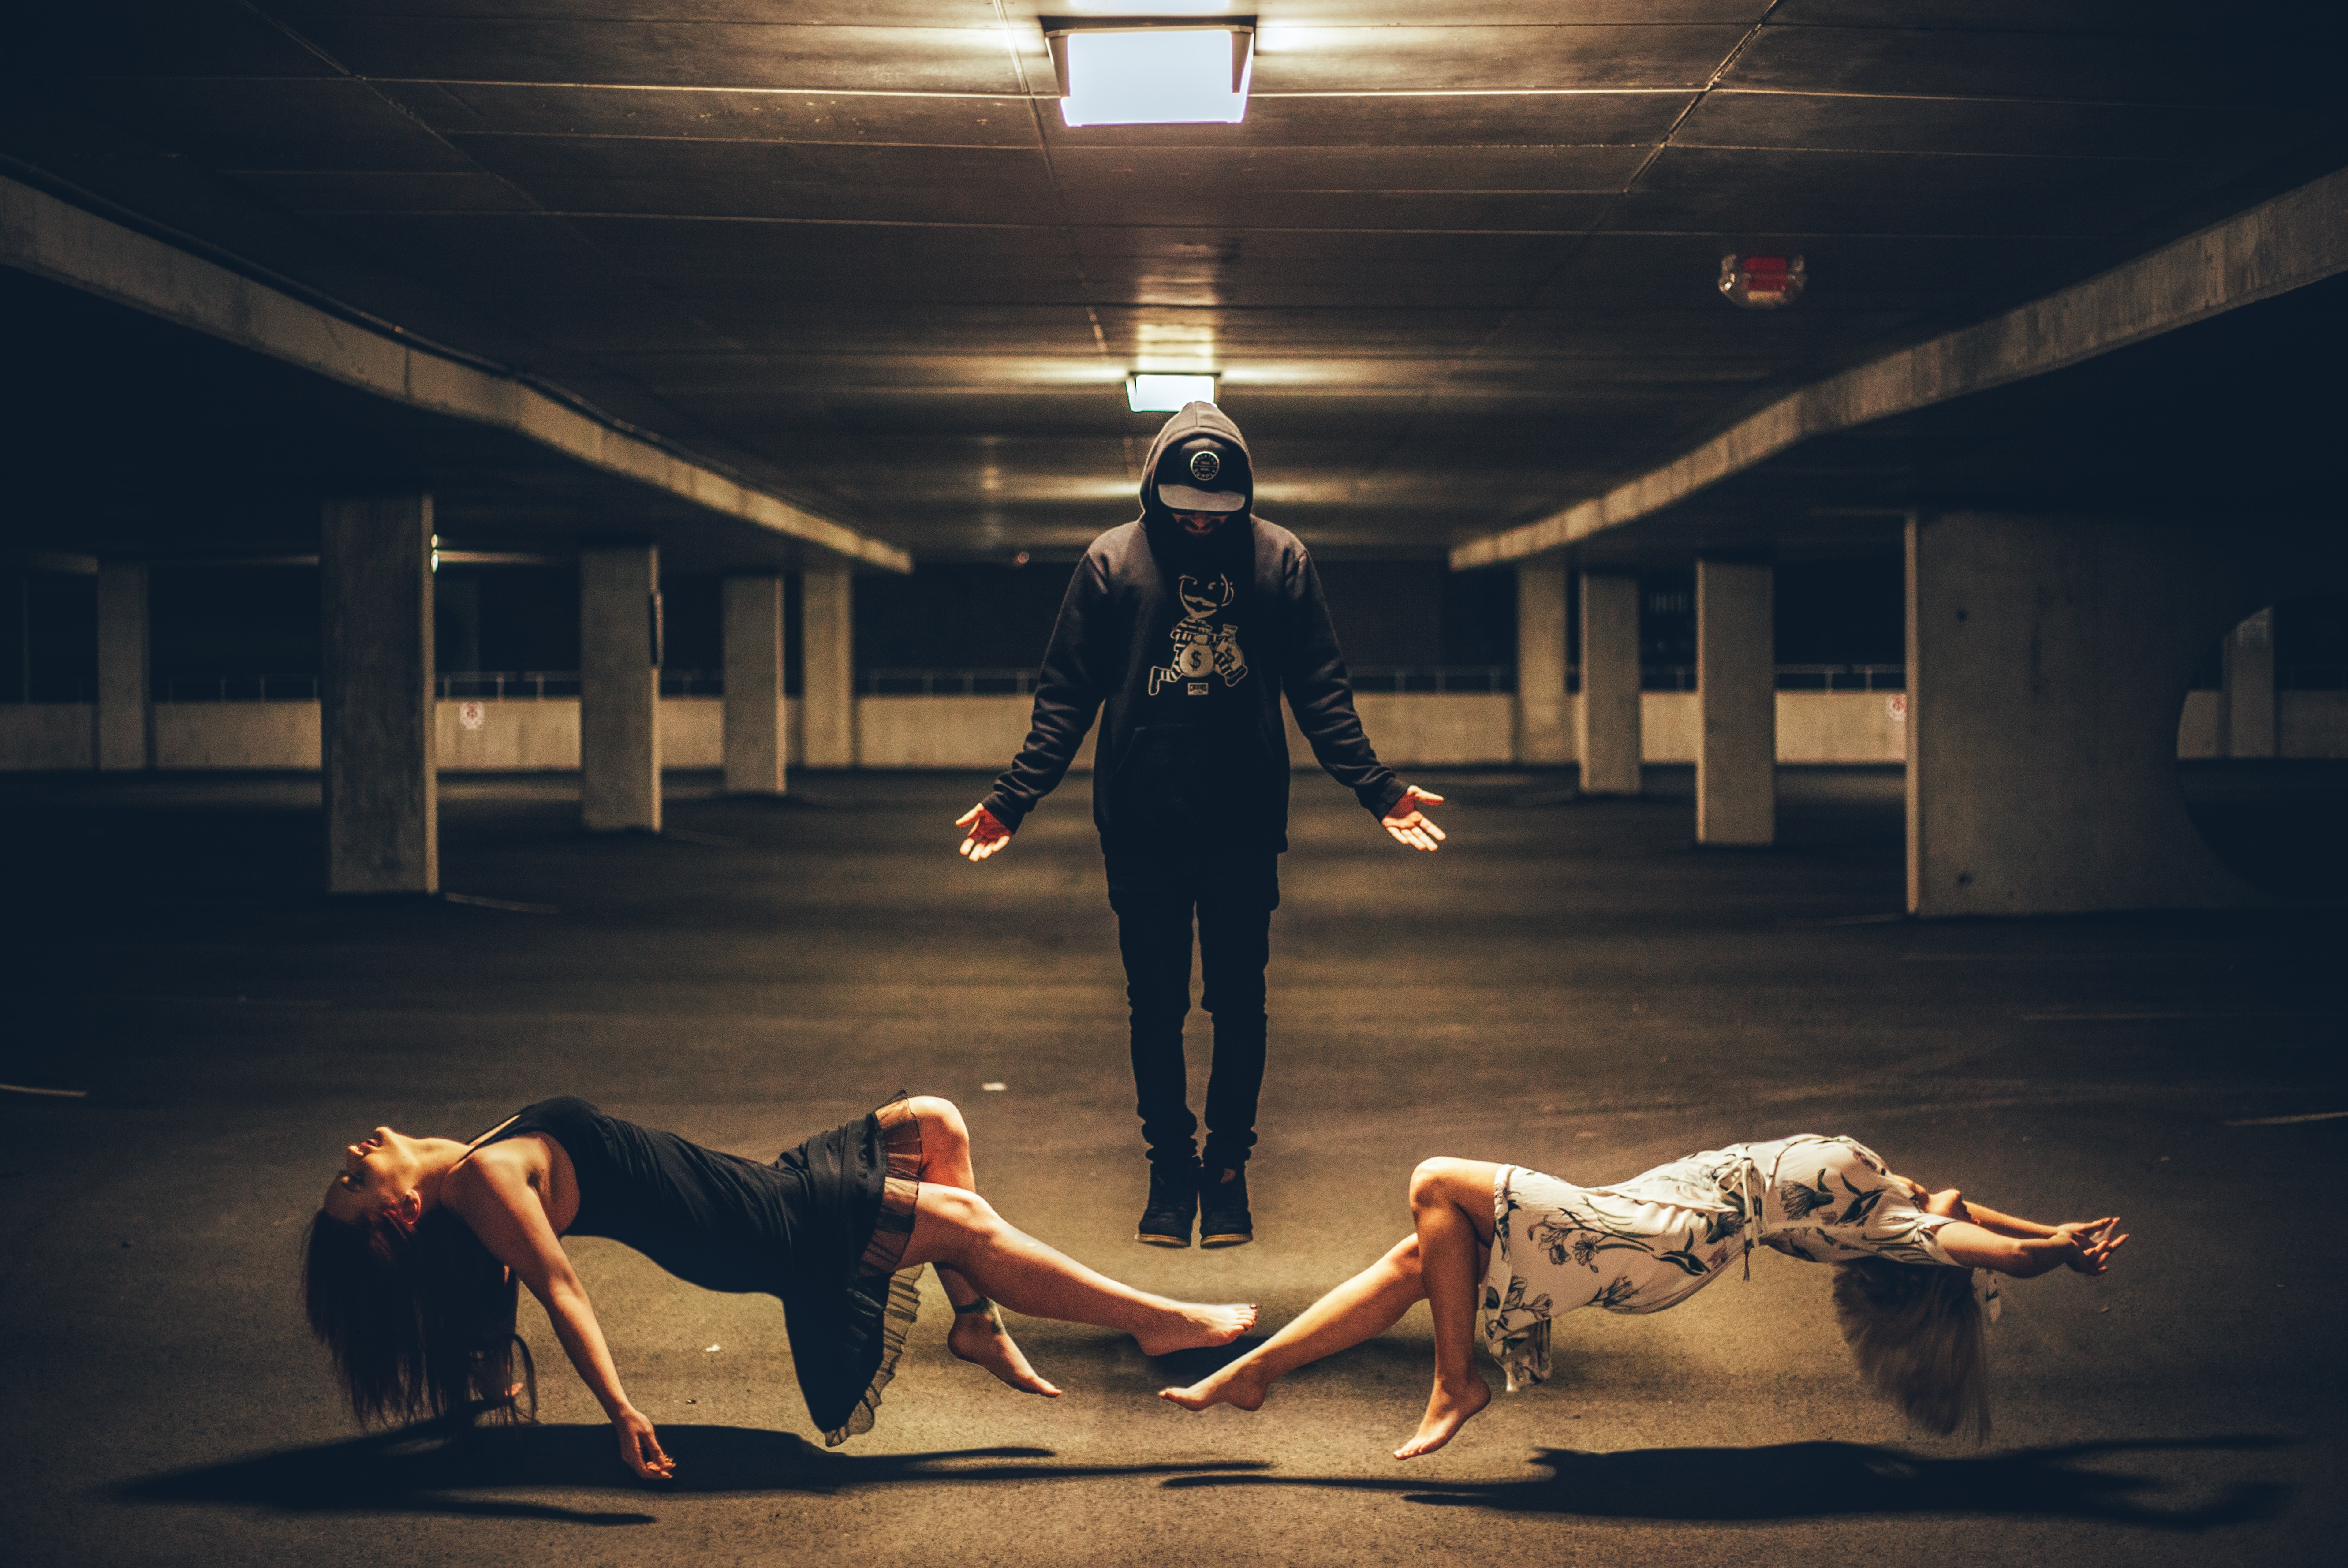 Levitating Magic Trick Hd Photography 4k Wallpapers